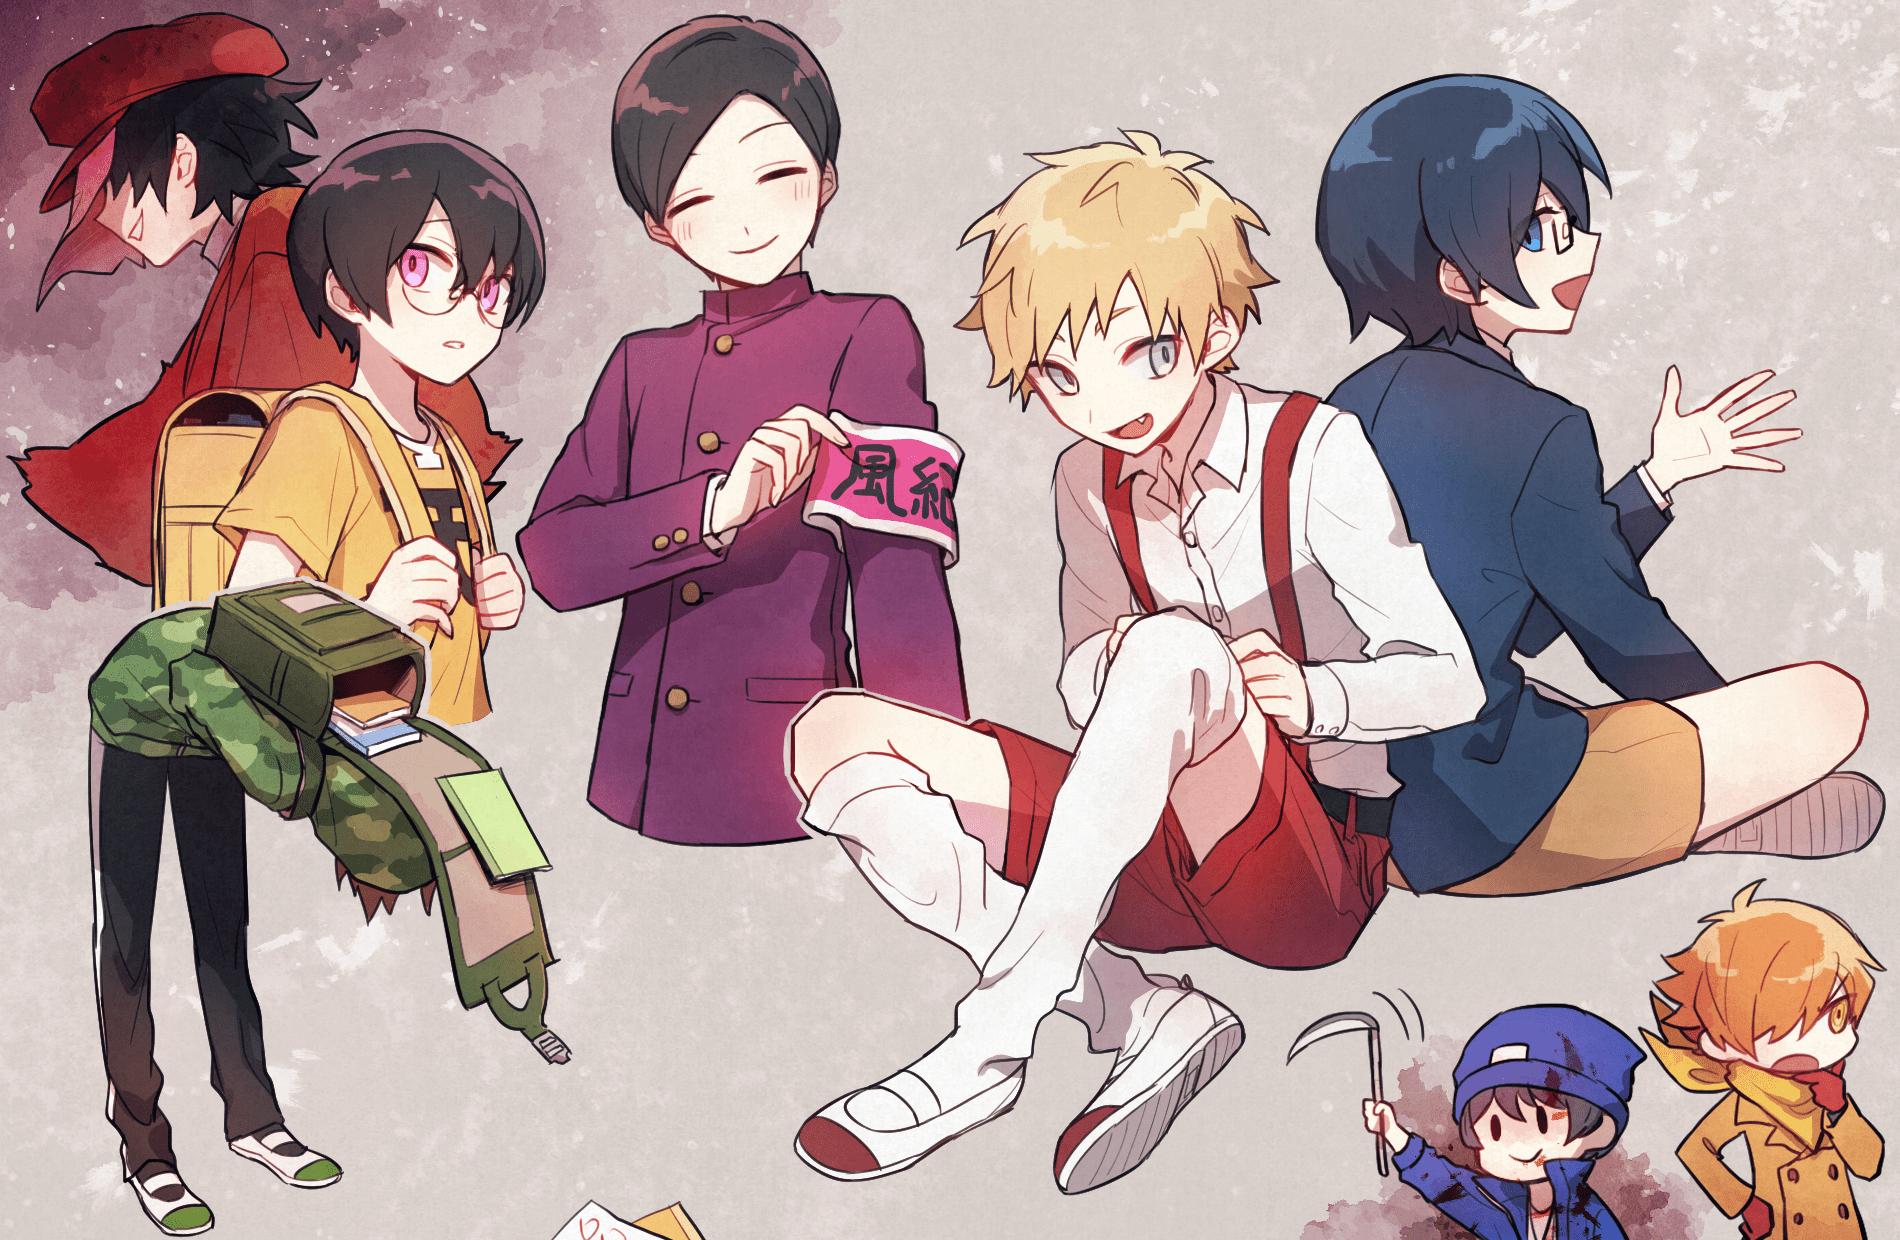 wataobi on twitter cute anime boy anime boy art day